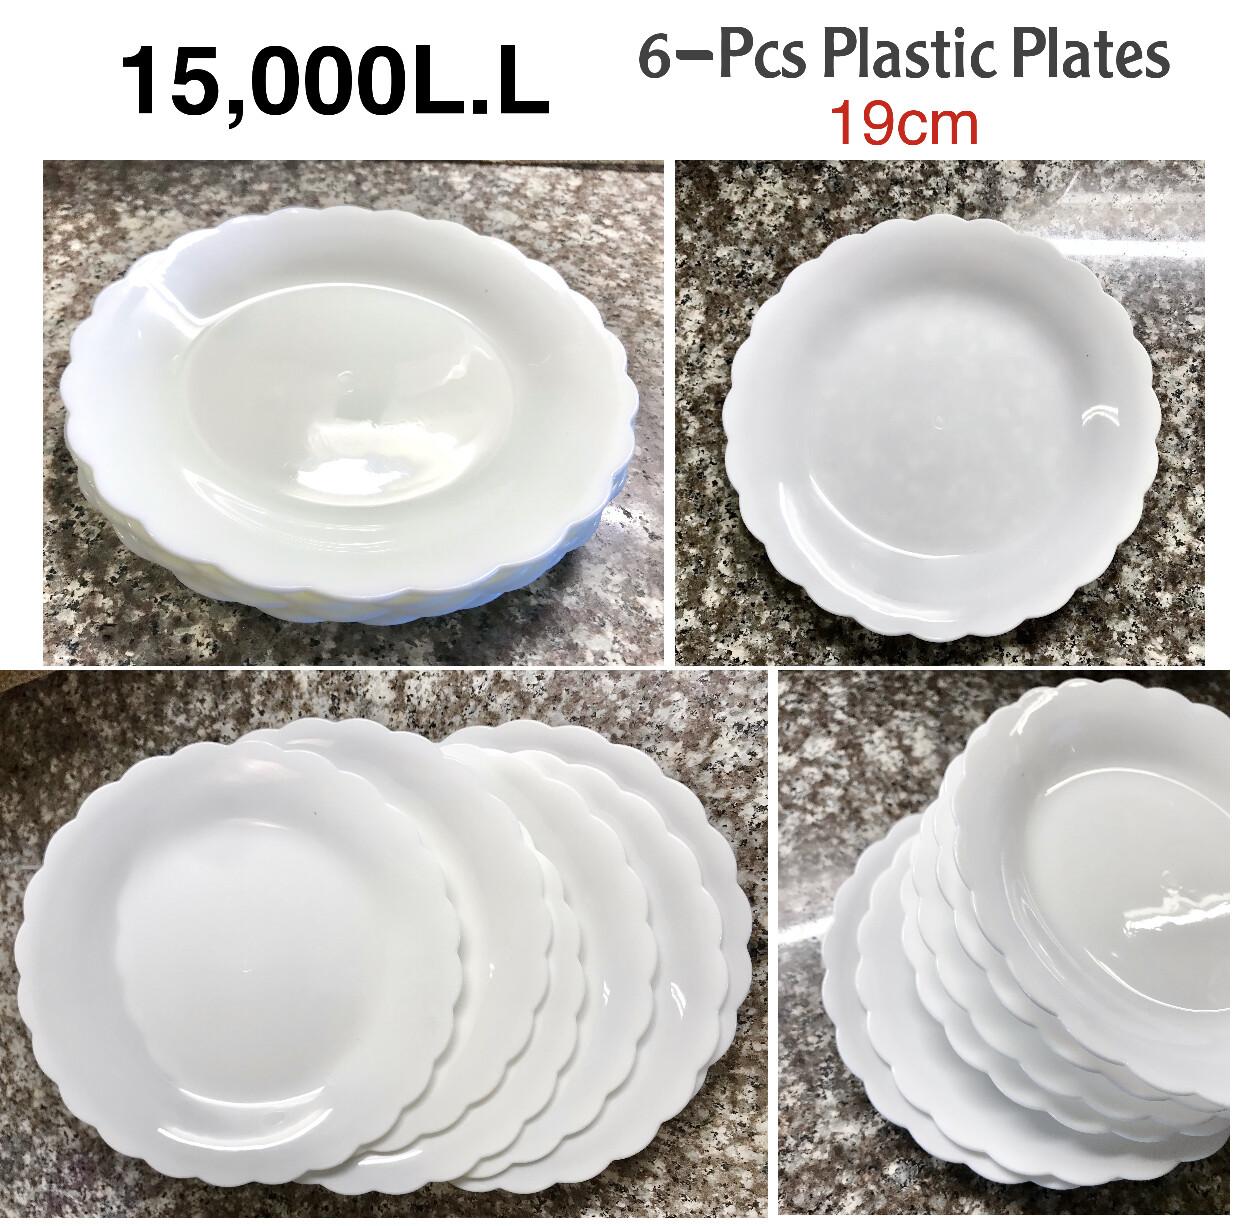 6-Pcs Plastic Plates (19cm)